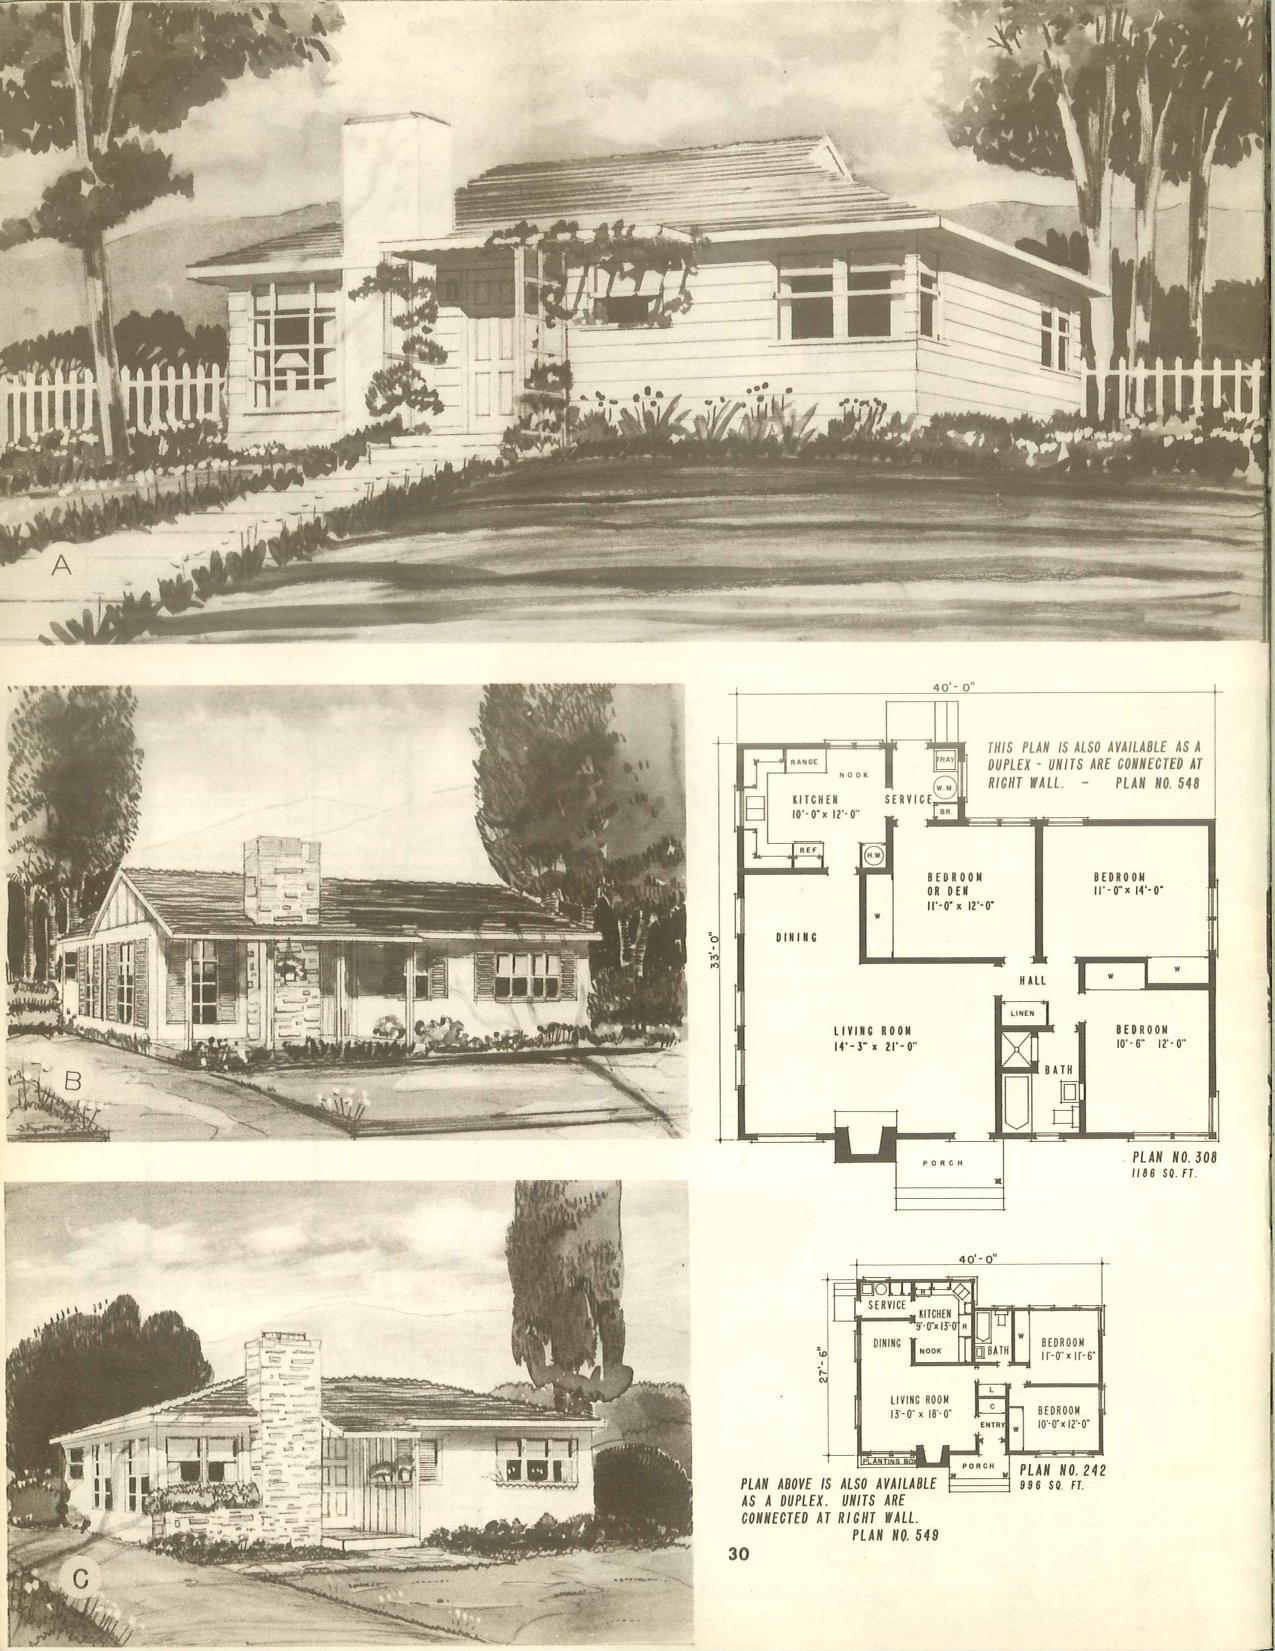 Harmonious Homes Vintage House Plans House Plans Residential House